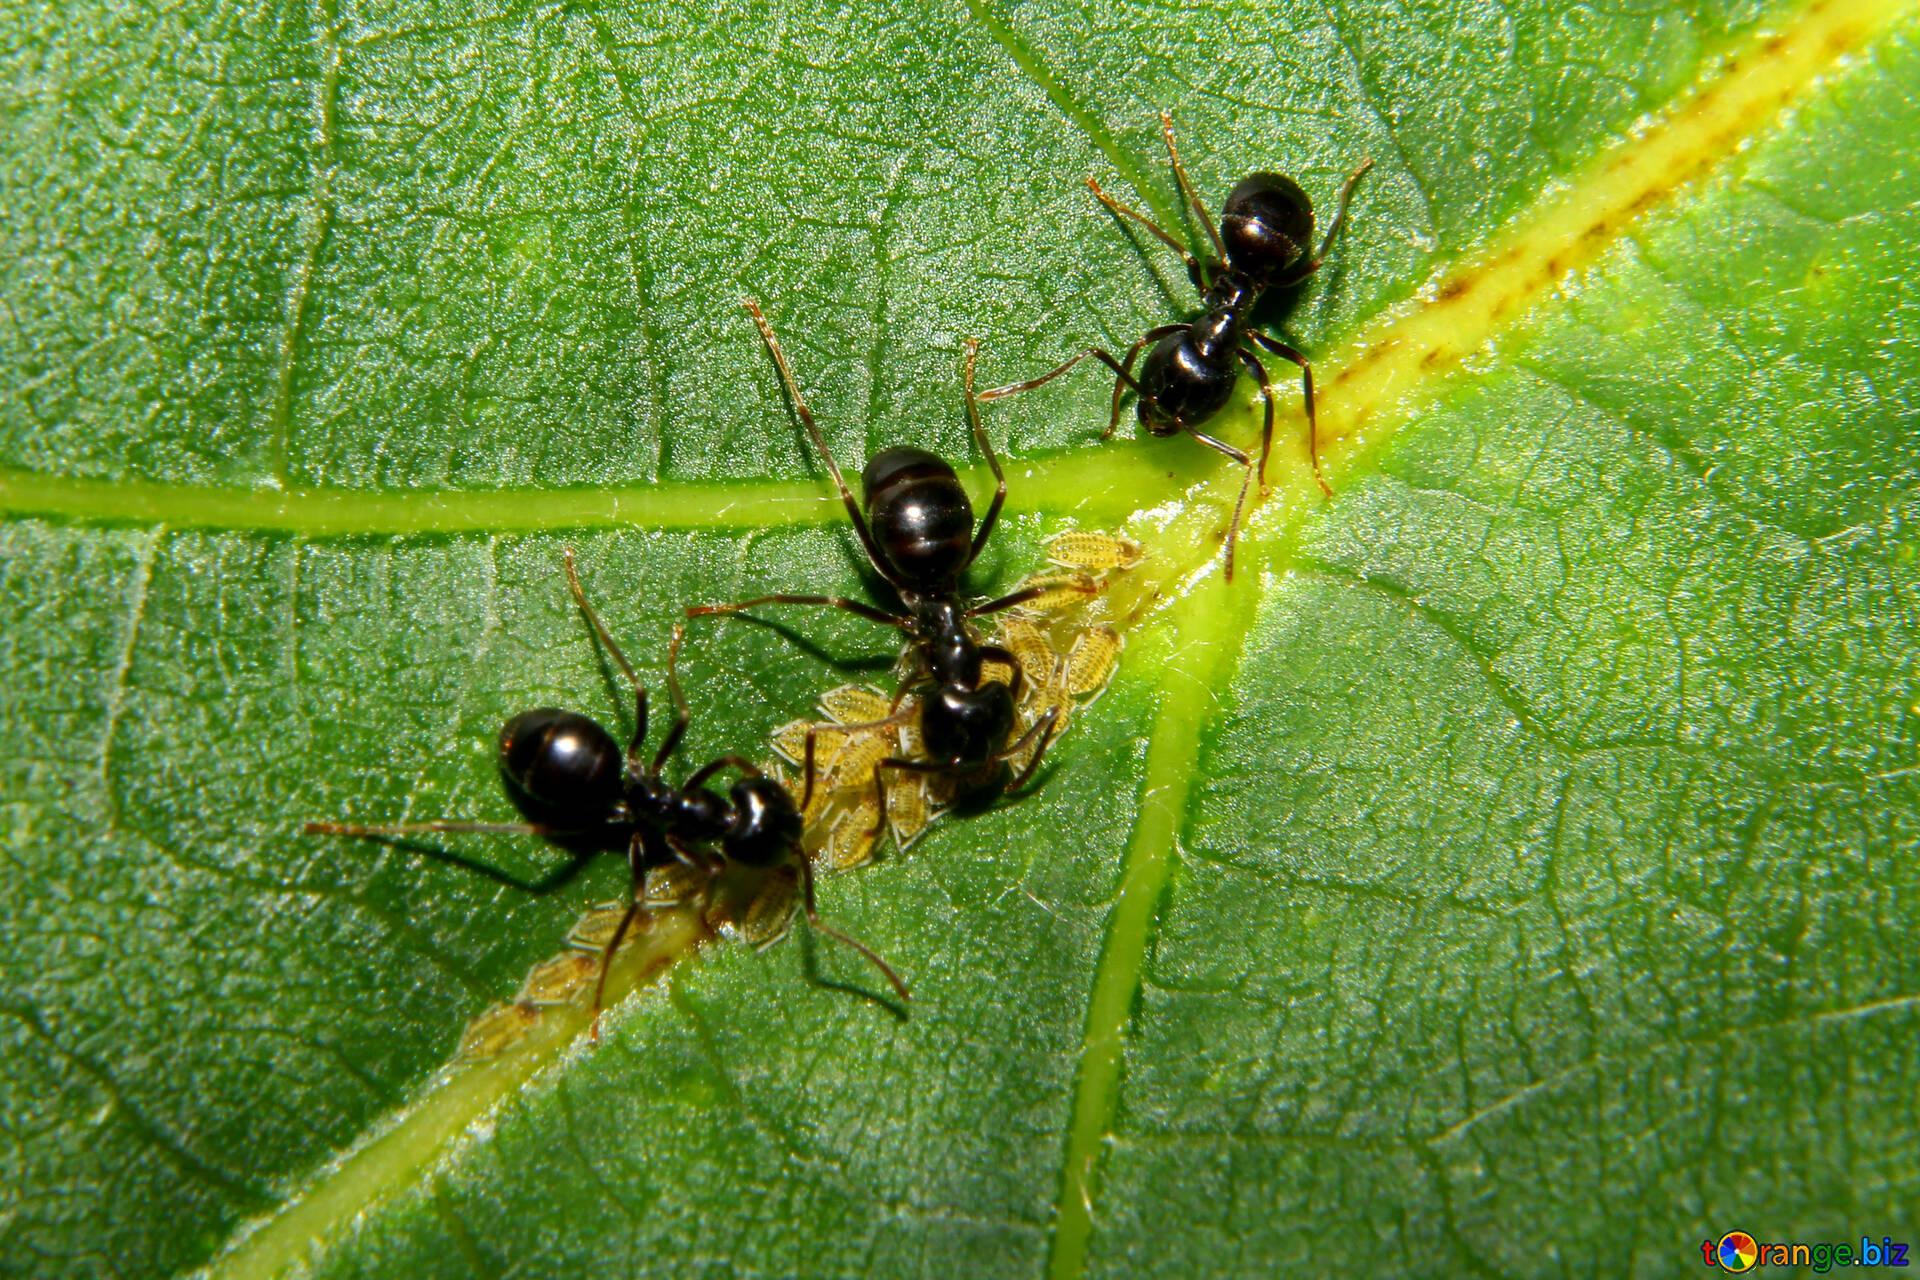 картинка мурашка фото если вас